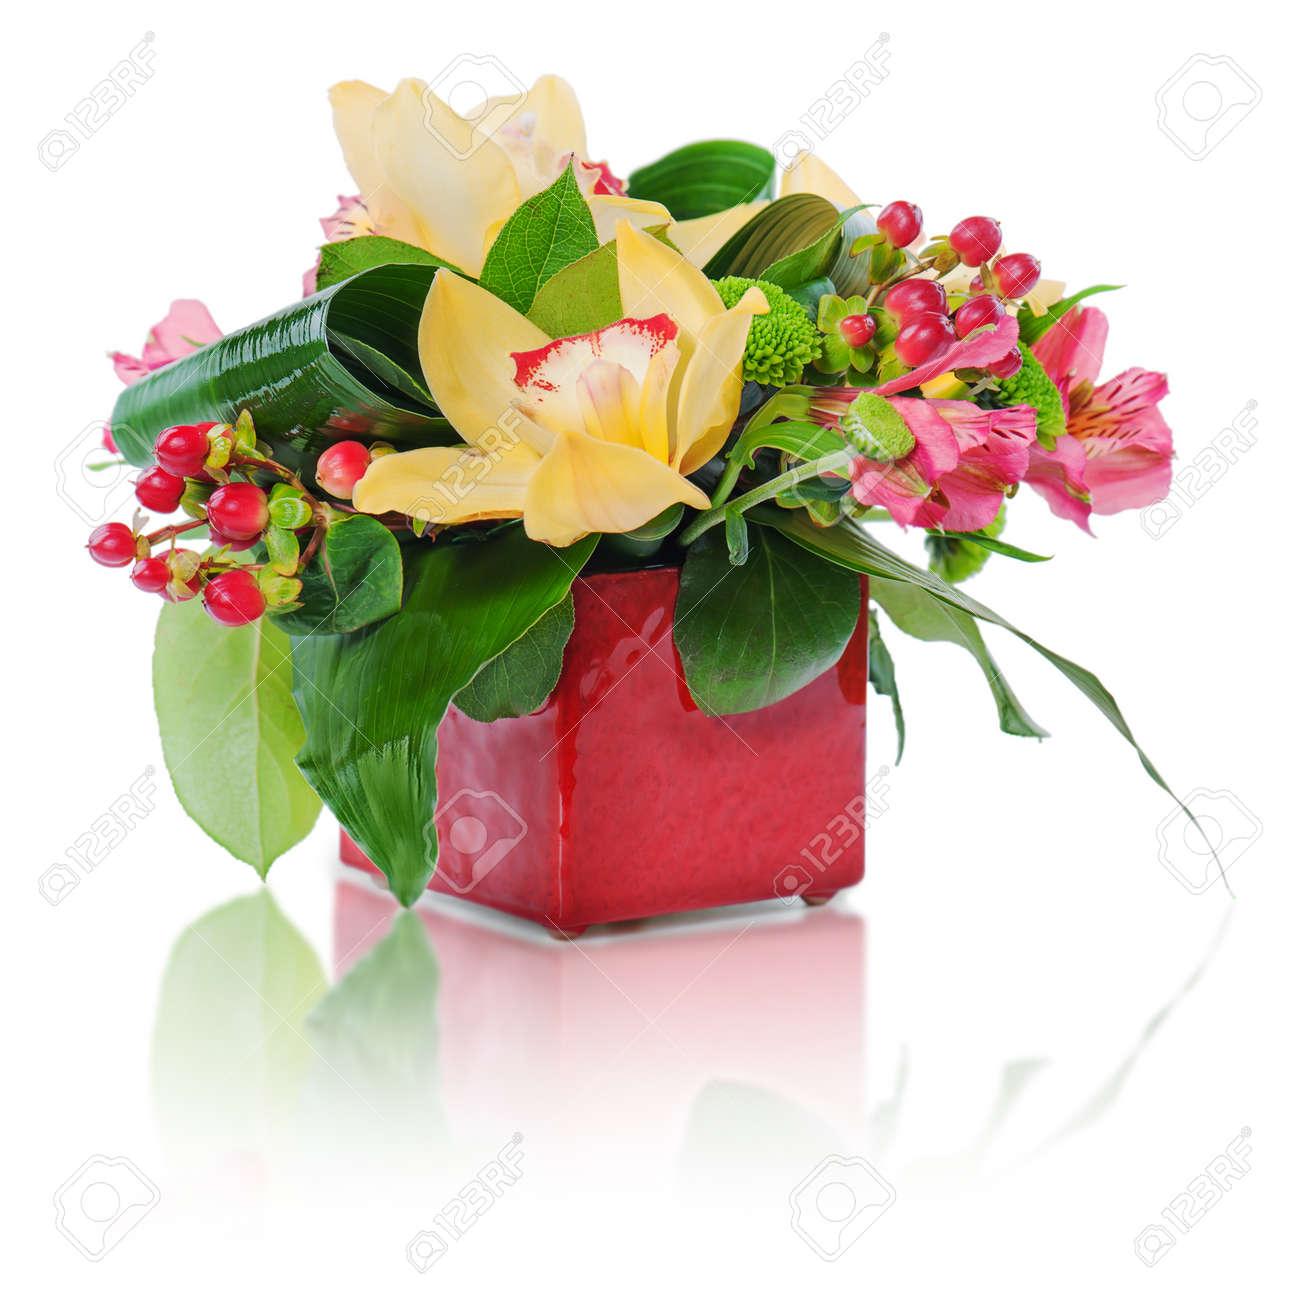 Colorful Floral Bouquet Of Roses, Cloves And Orchids Arrangement ...